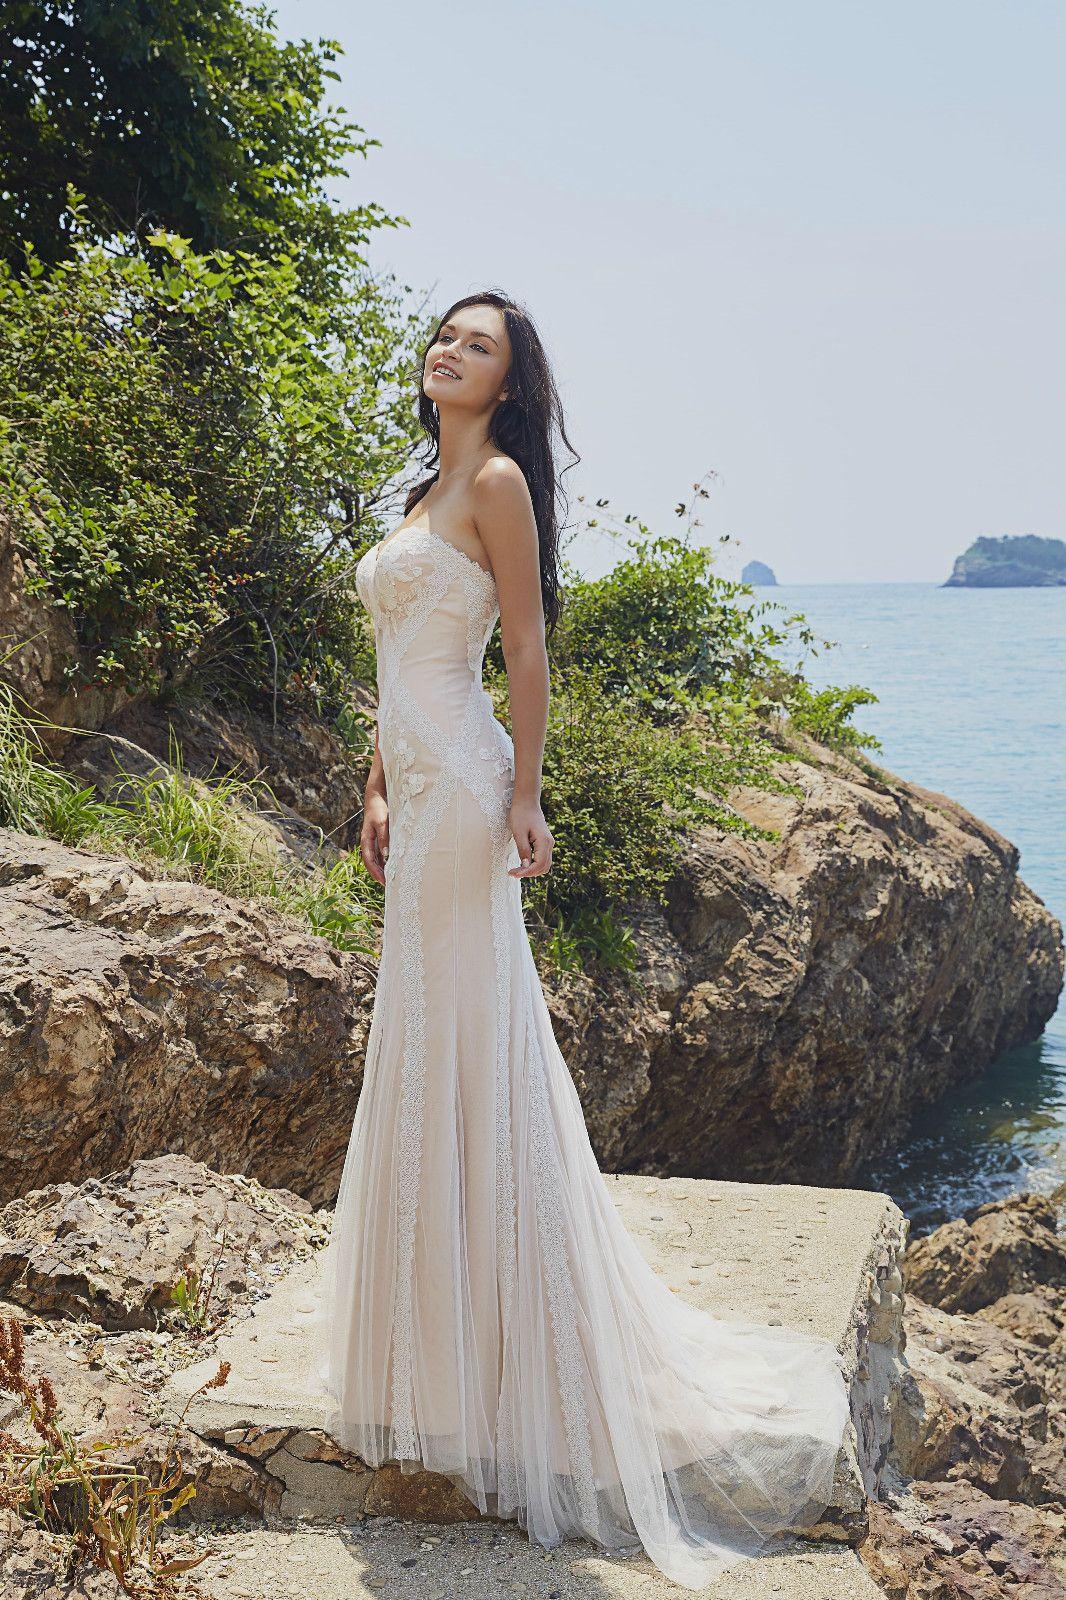 Devon - BRIDAL - Chic Nostalgia - Chic Nostalgia   Wedding Dress ...